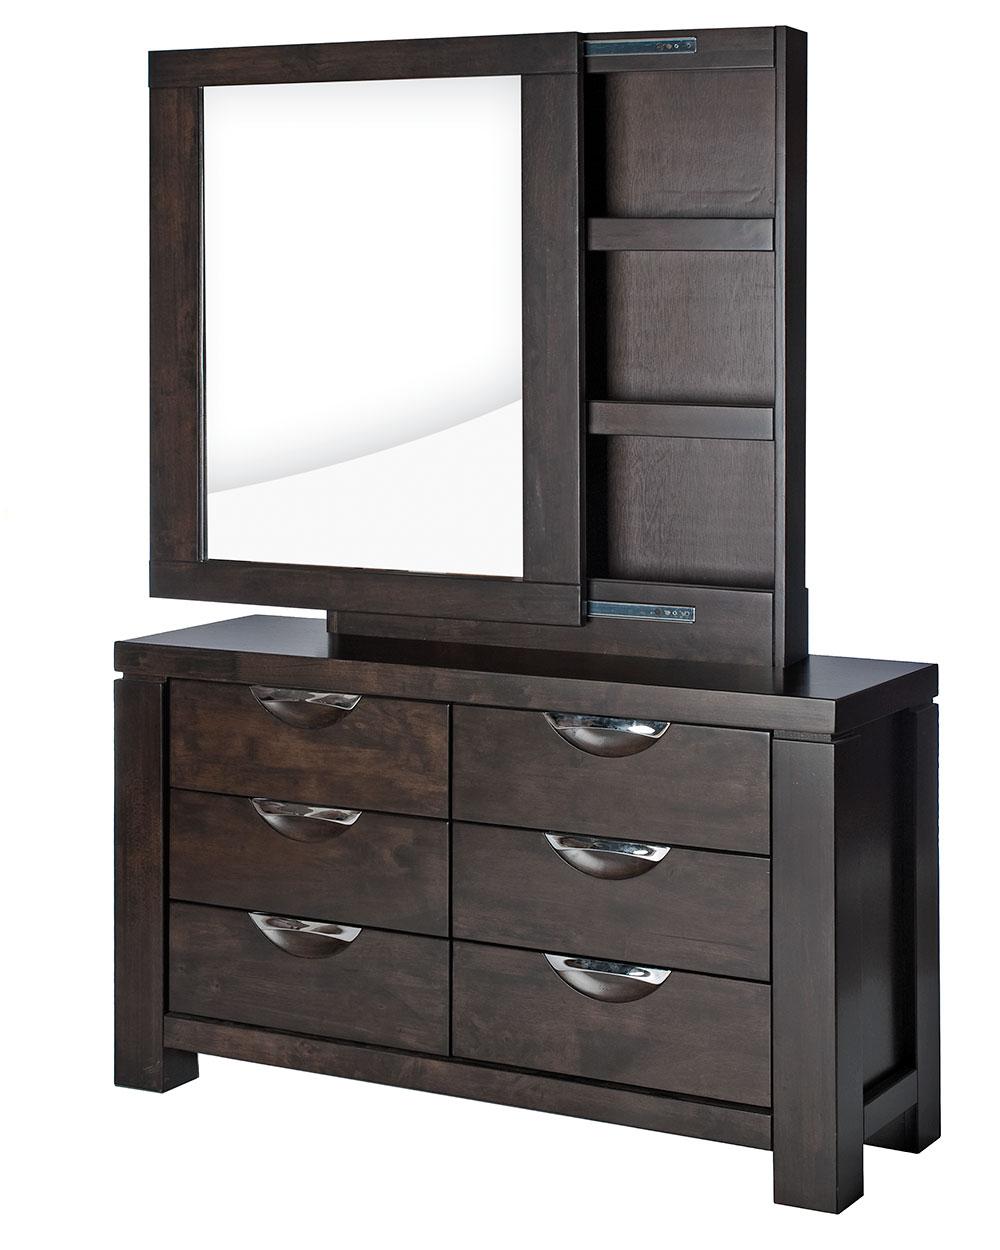 photographer-room-set-furniture-004.jpg